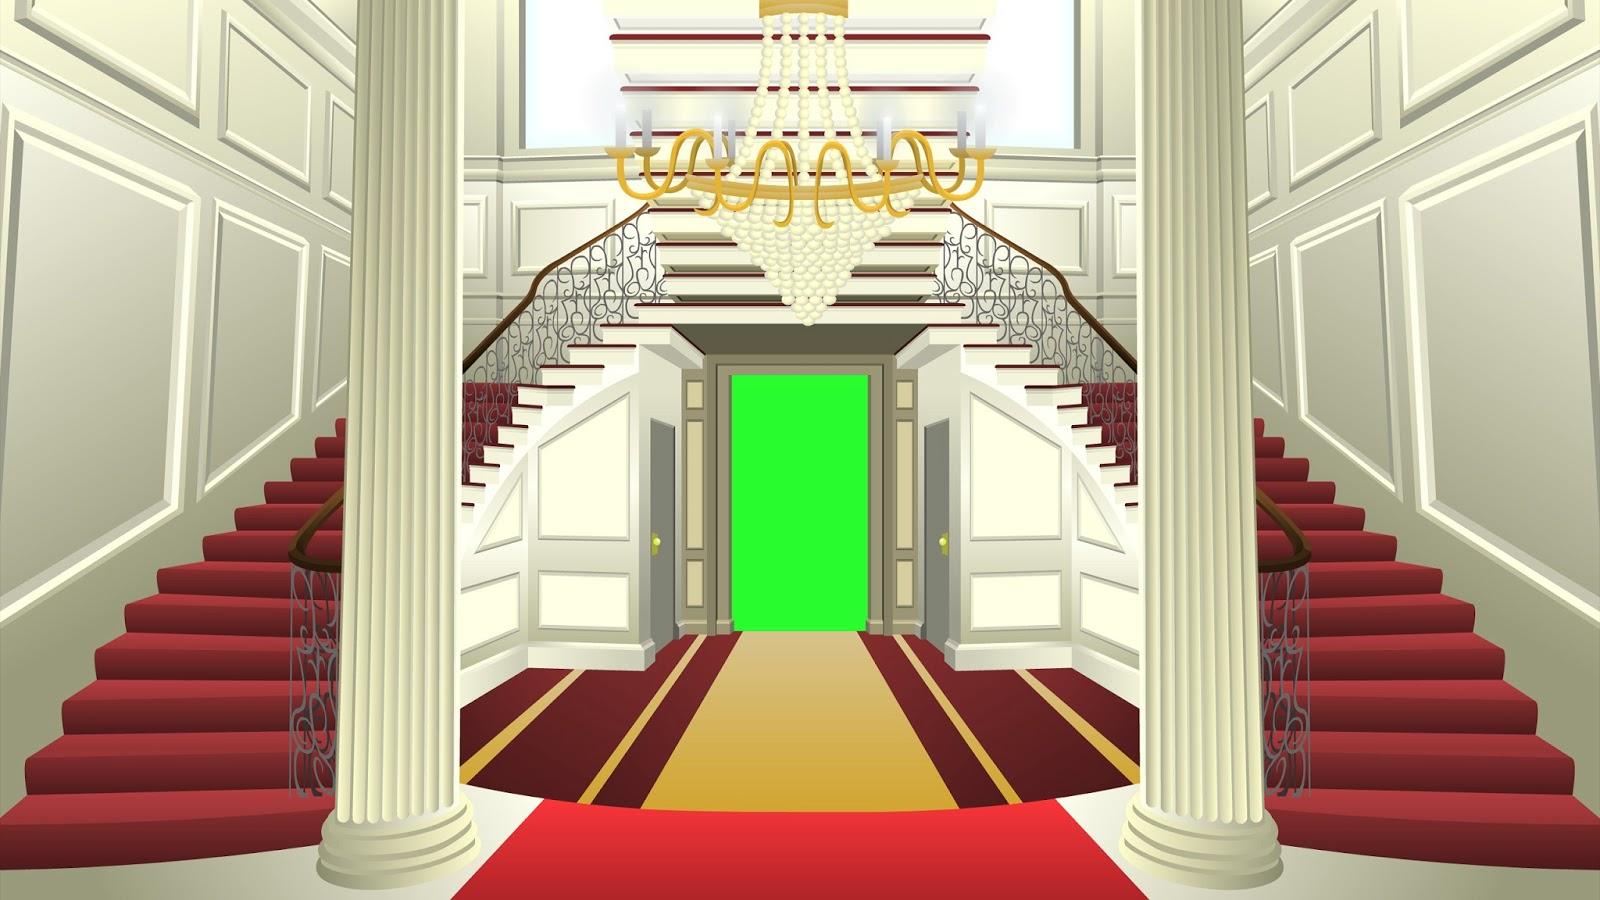 Mansion Foyer Email : Fancyfilms mansion foyer background